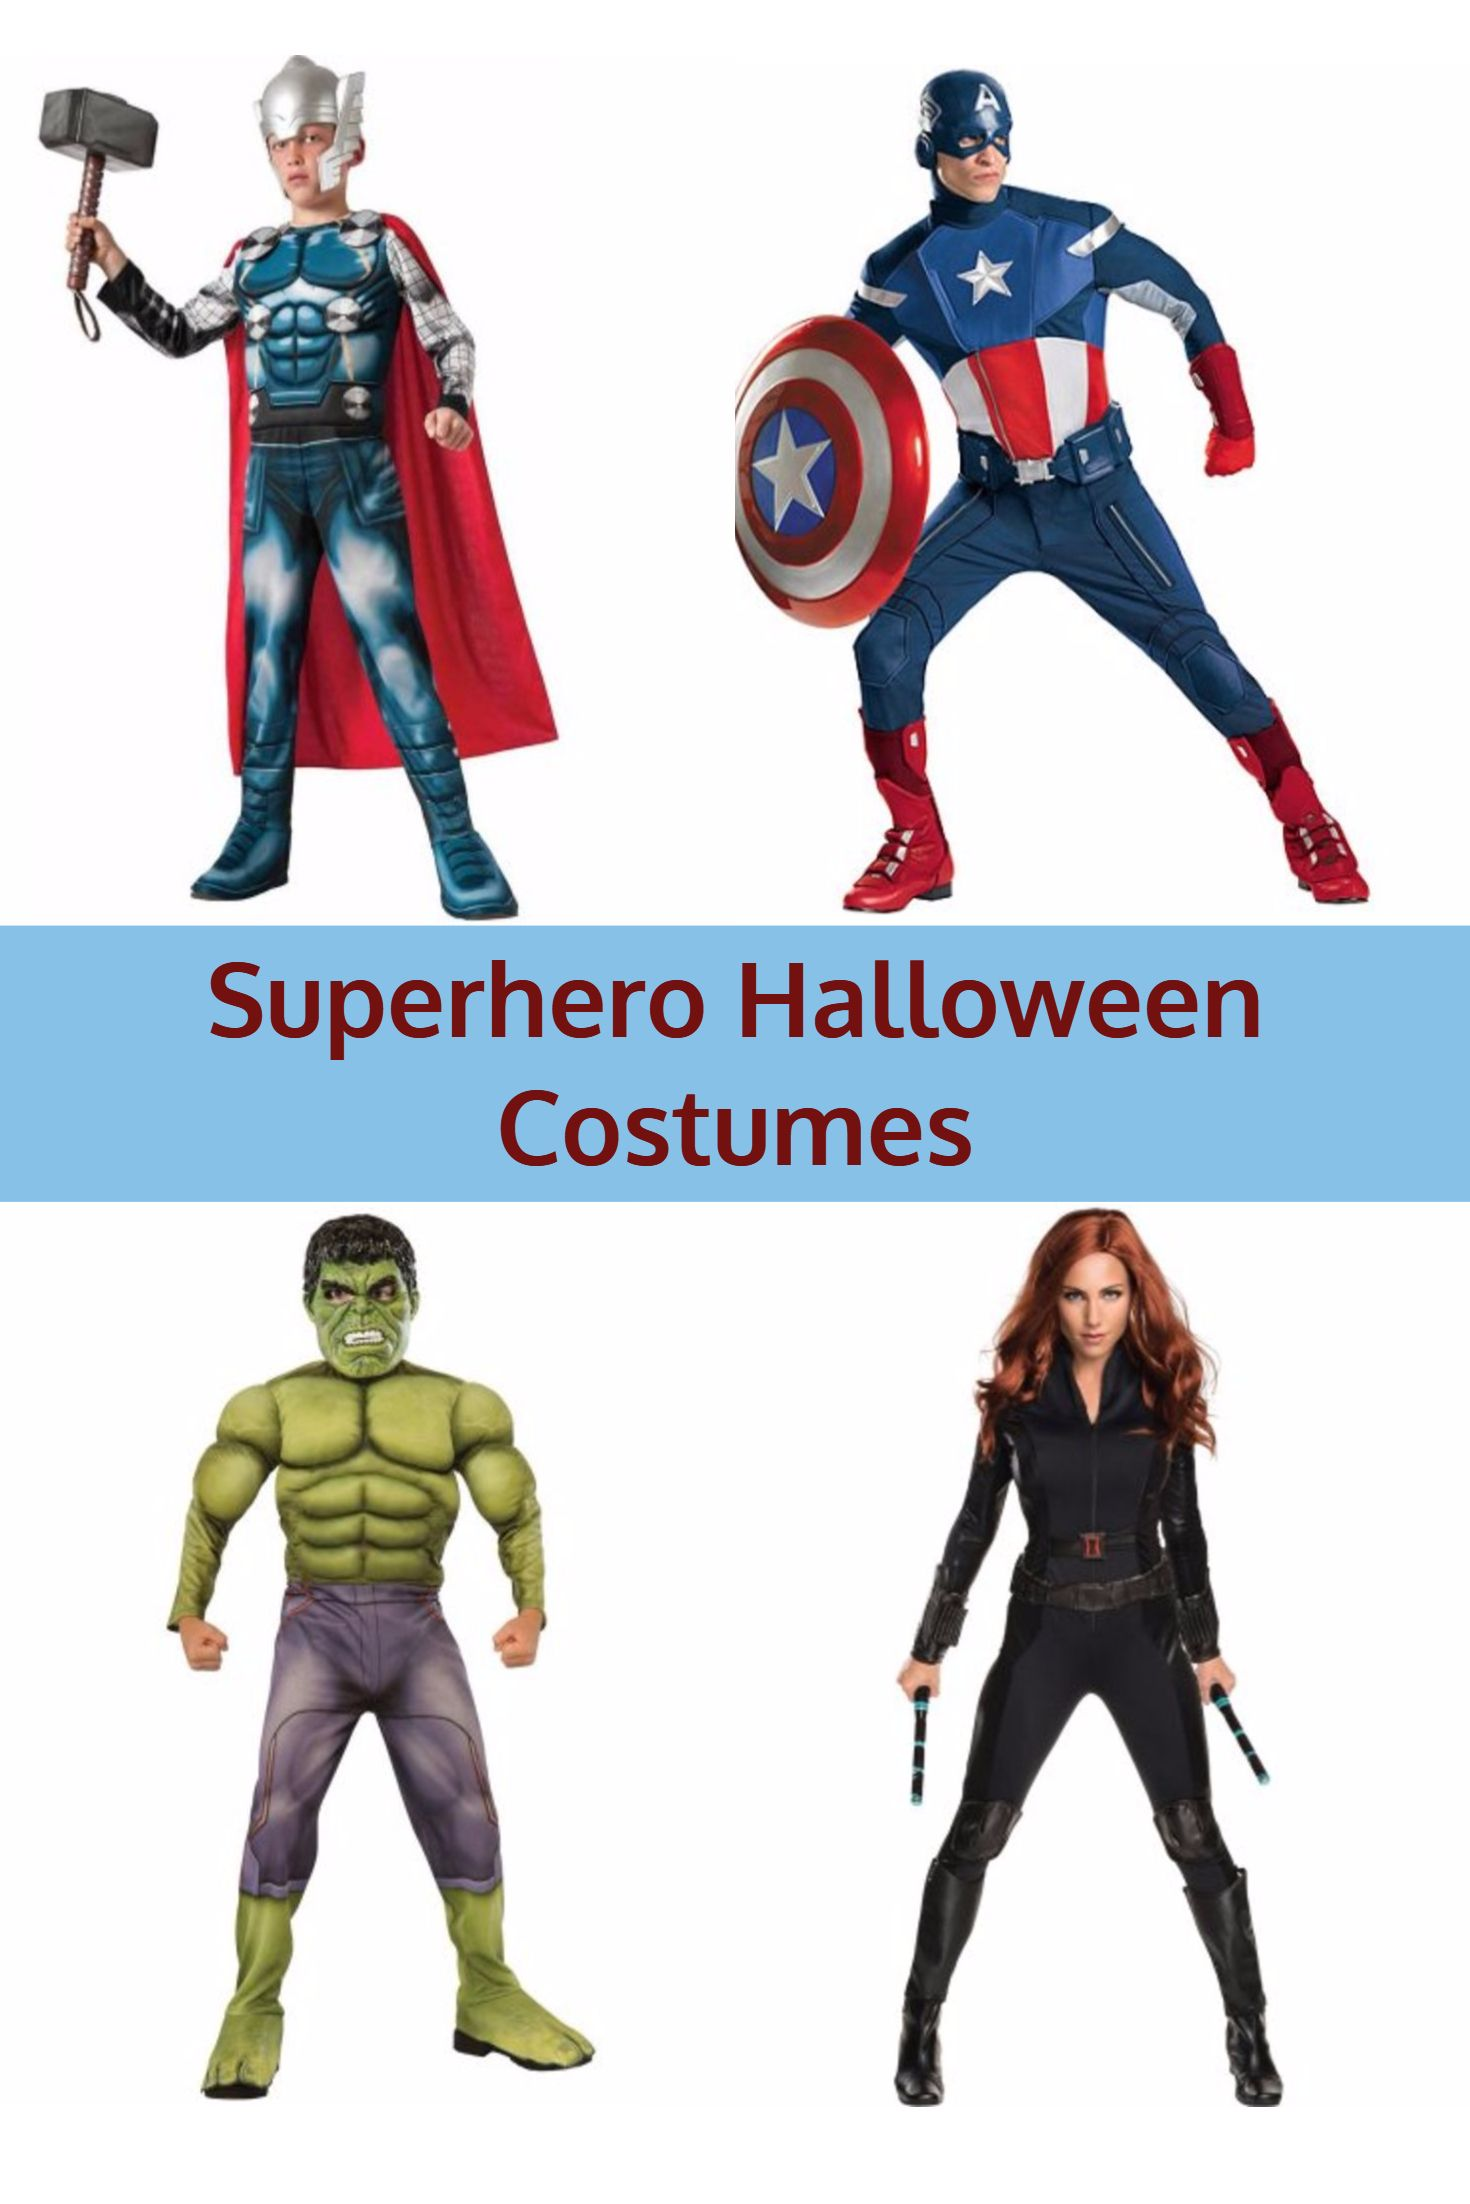 Halloween Costumes 2020 Heros Best Avengers Superhero Halloween Costumes 2020 | Kims Home Ideas